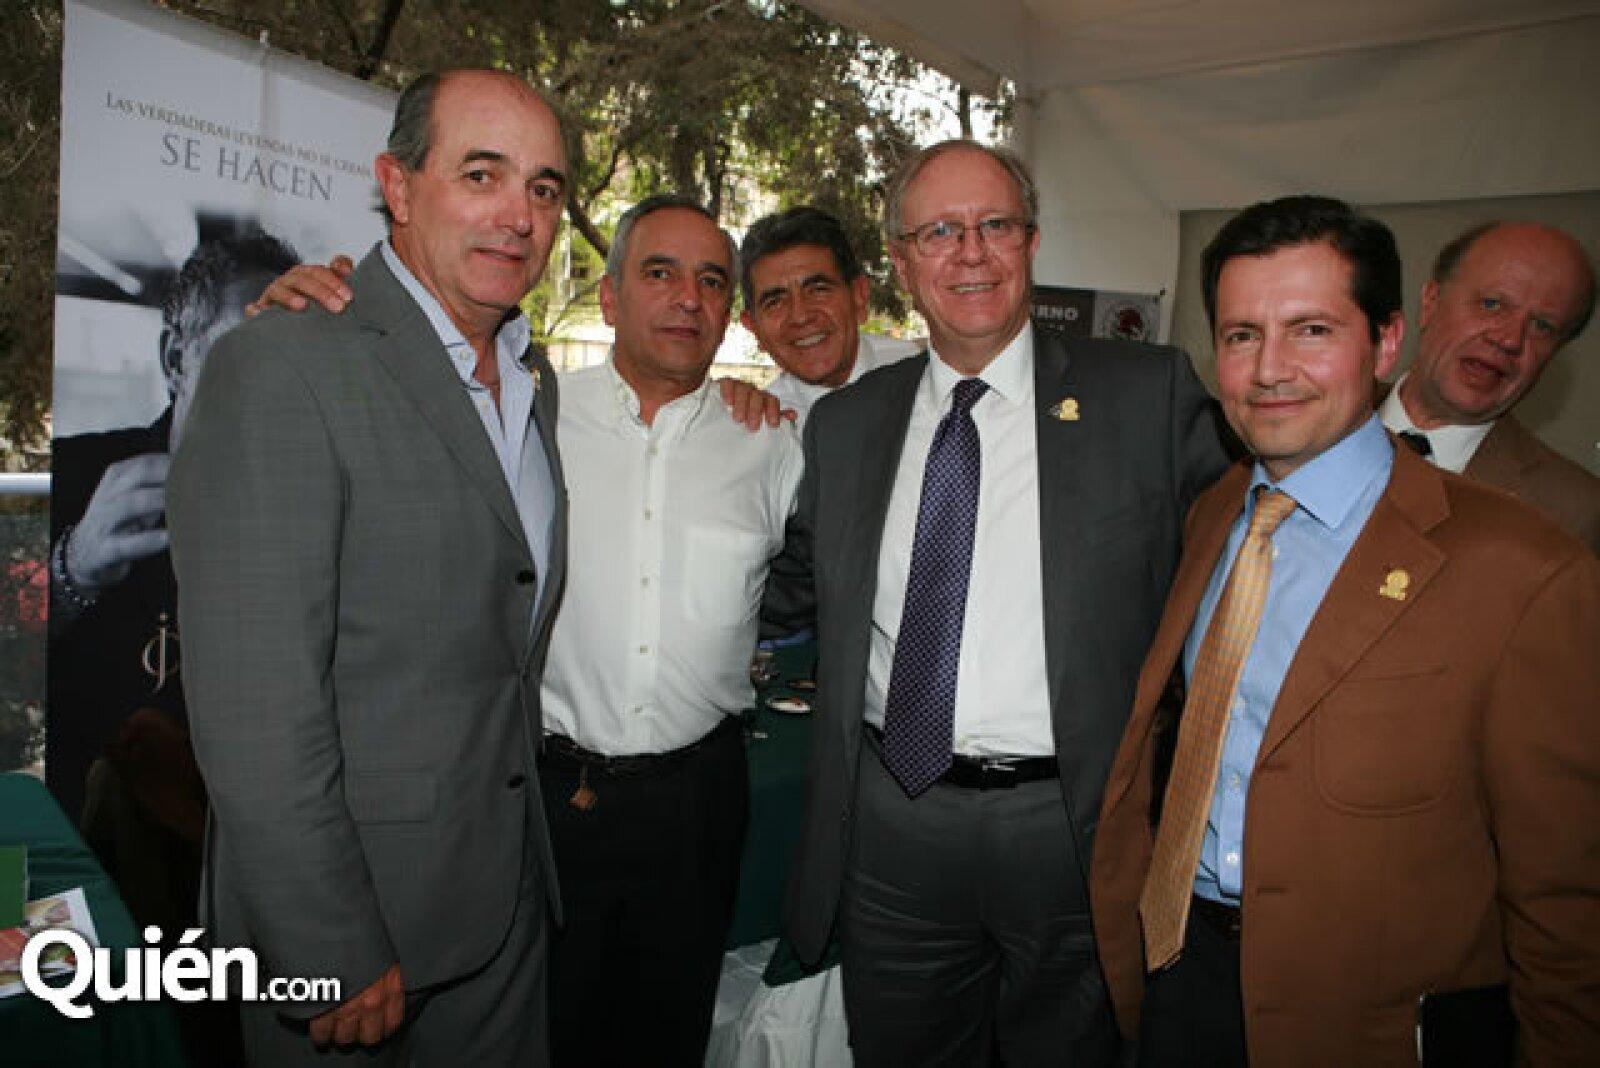 Manuel Gutiérrez, Daniel Loeza, Fernando Morales y Federico Fernández Quiroz